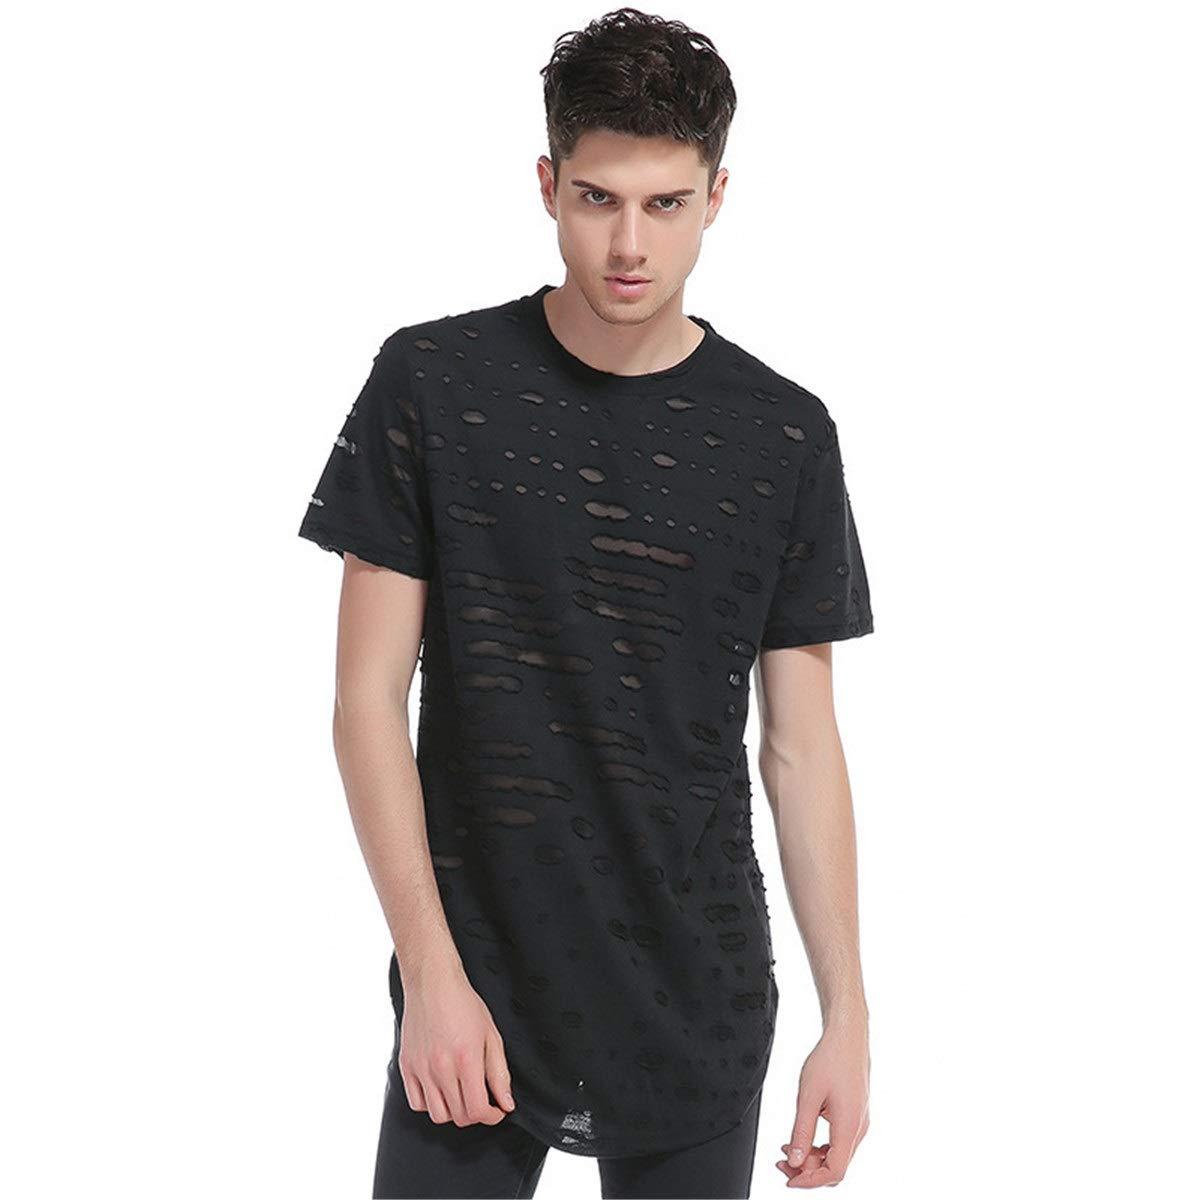 DKDUVQ Sports T-Shirt Mens Hole Round Neck Short-Sleeved Hip-hop T-Shirt